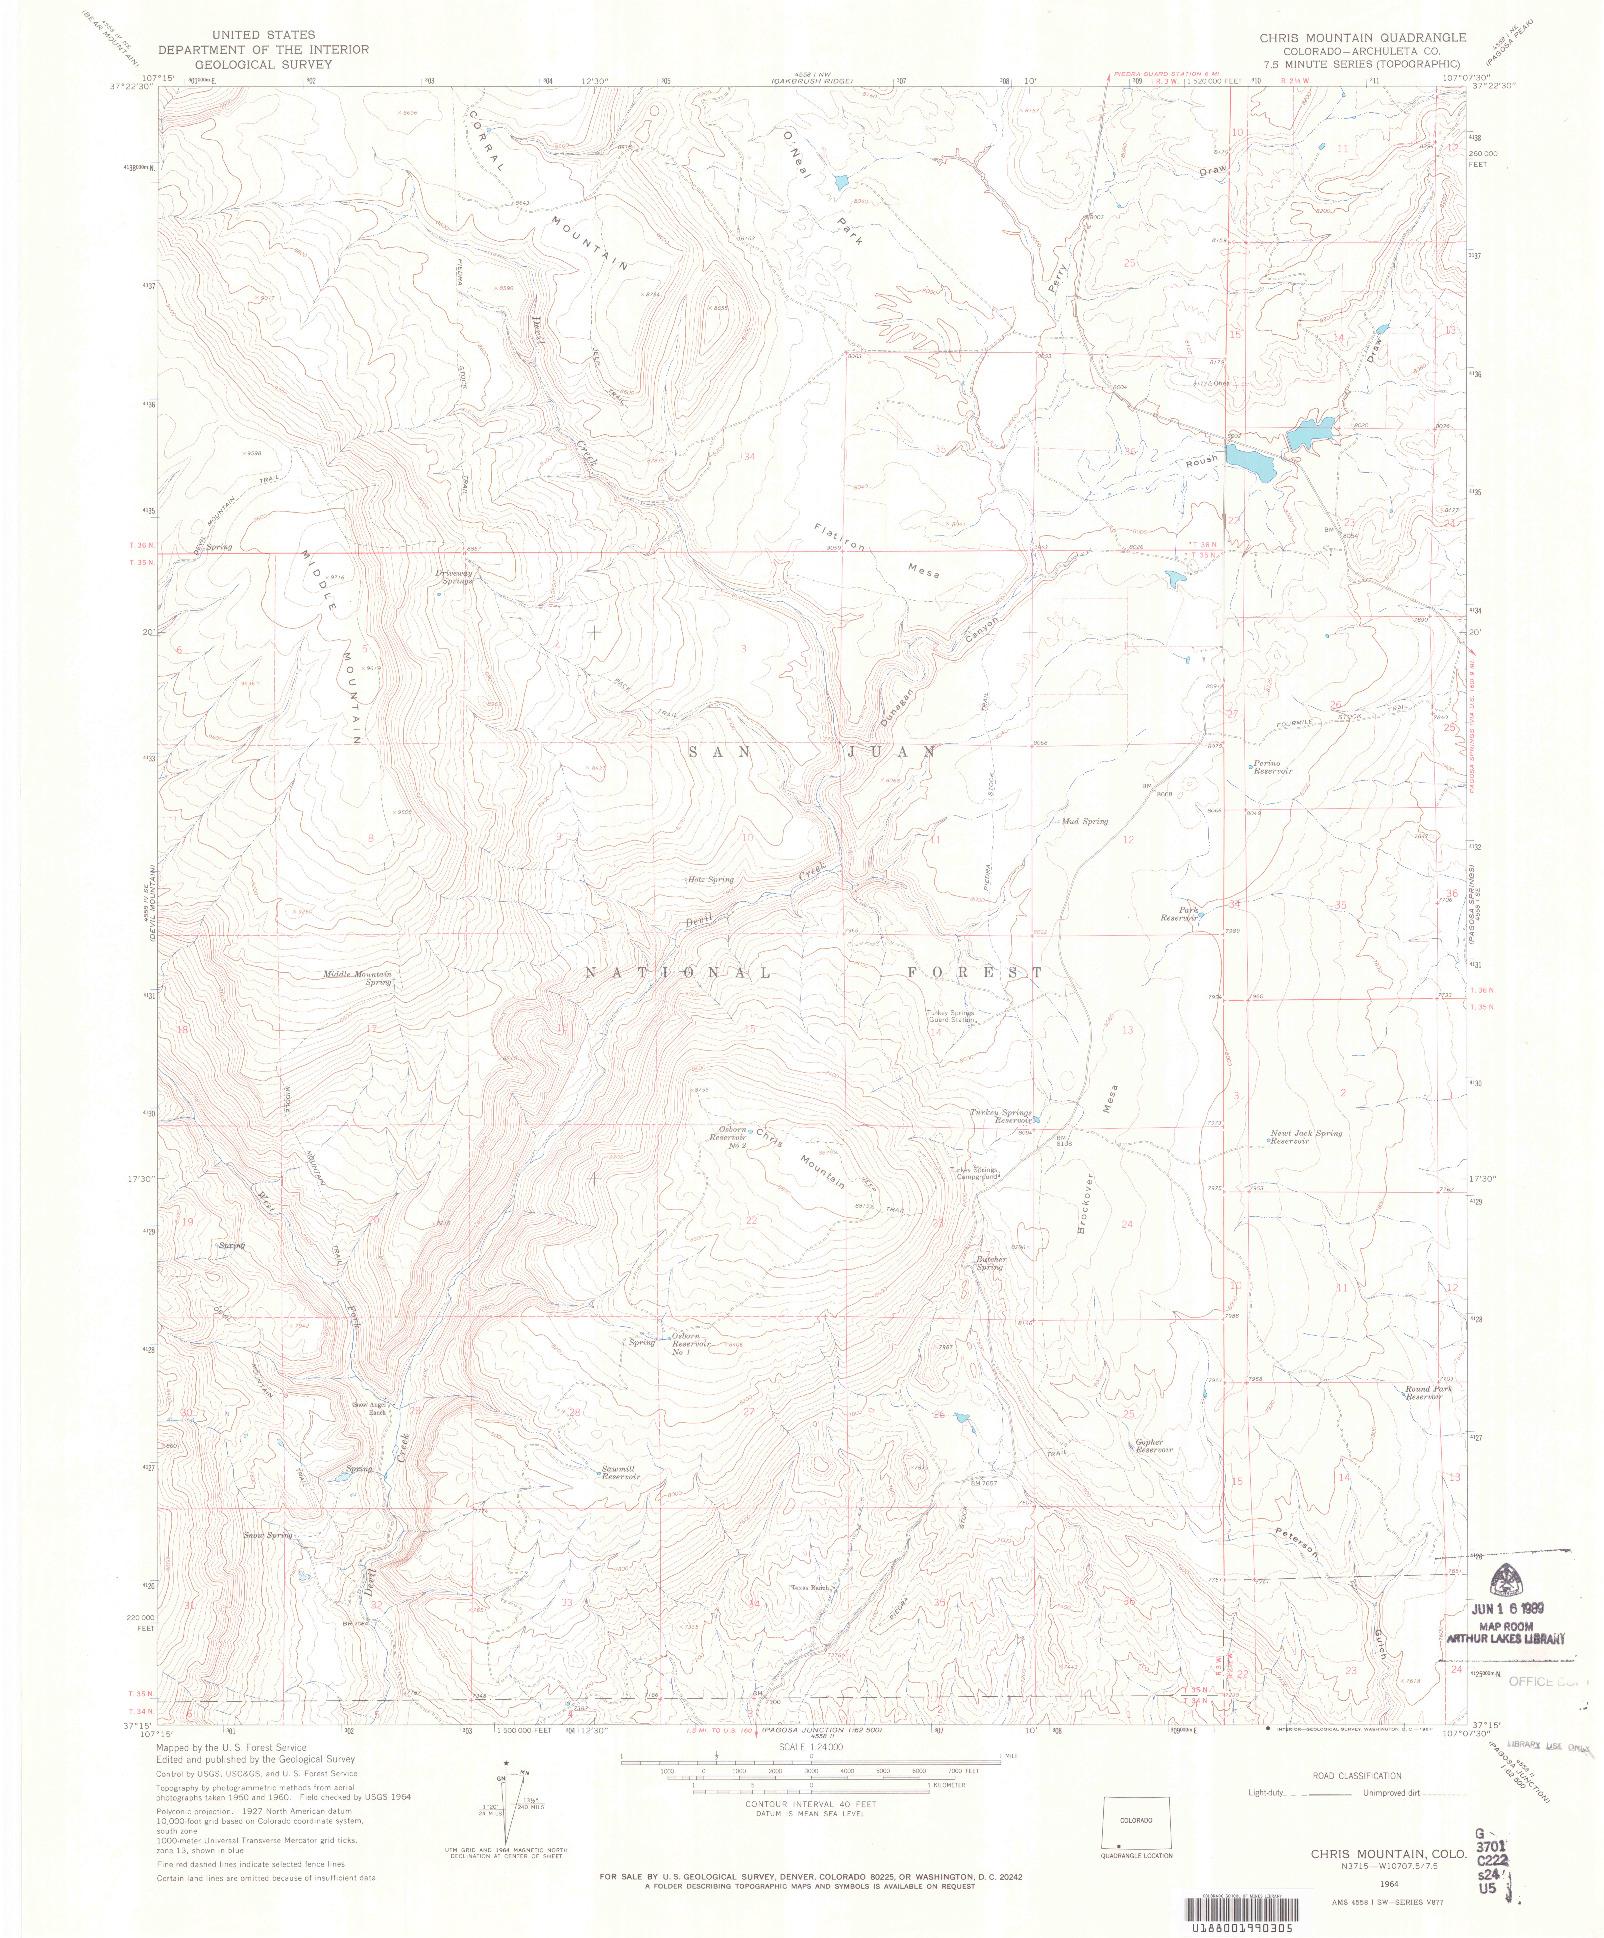 USGS 1:24000-SCALE QUADRANGLE FOR CHRIS MOUNTAIN, CO 1964